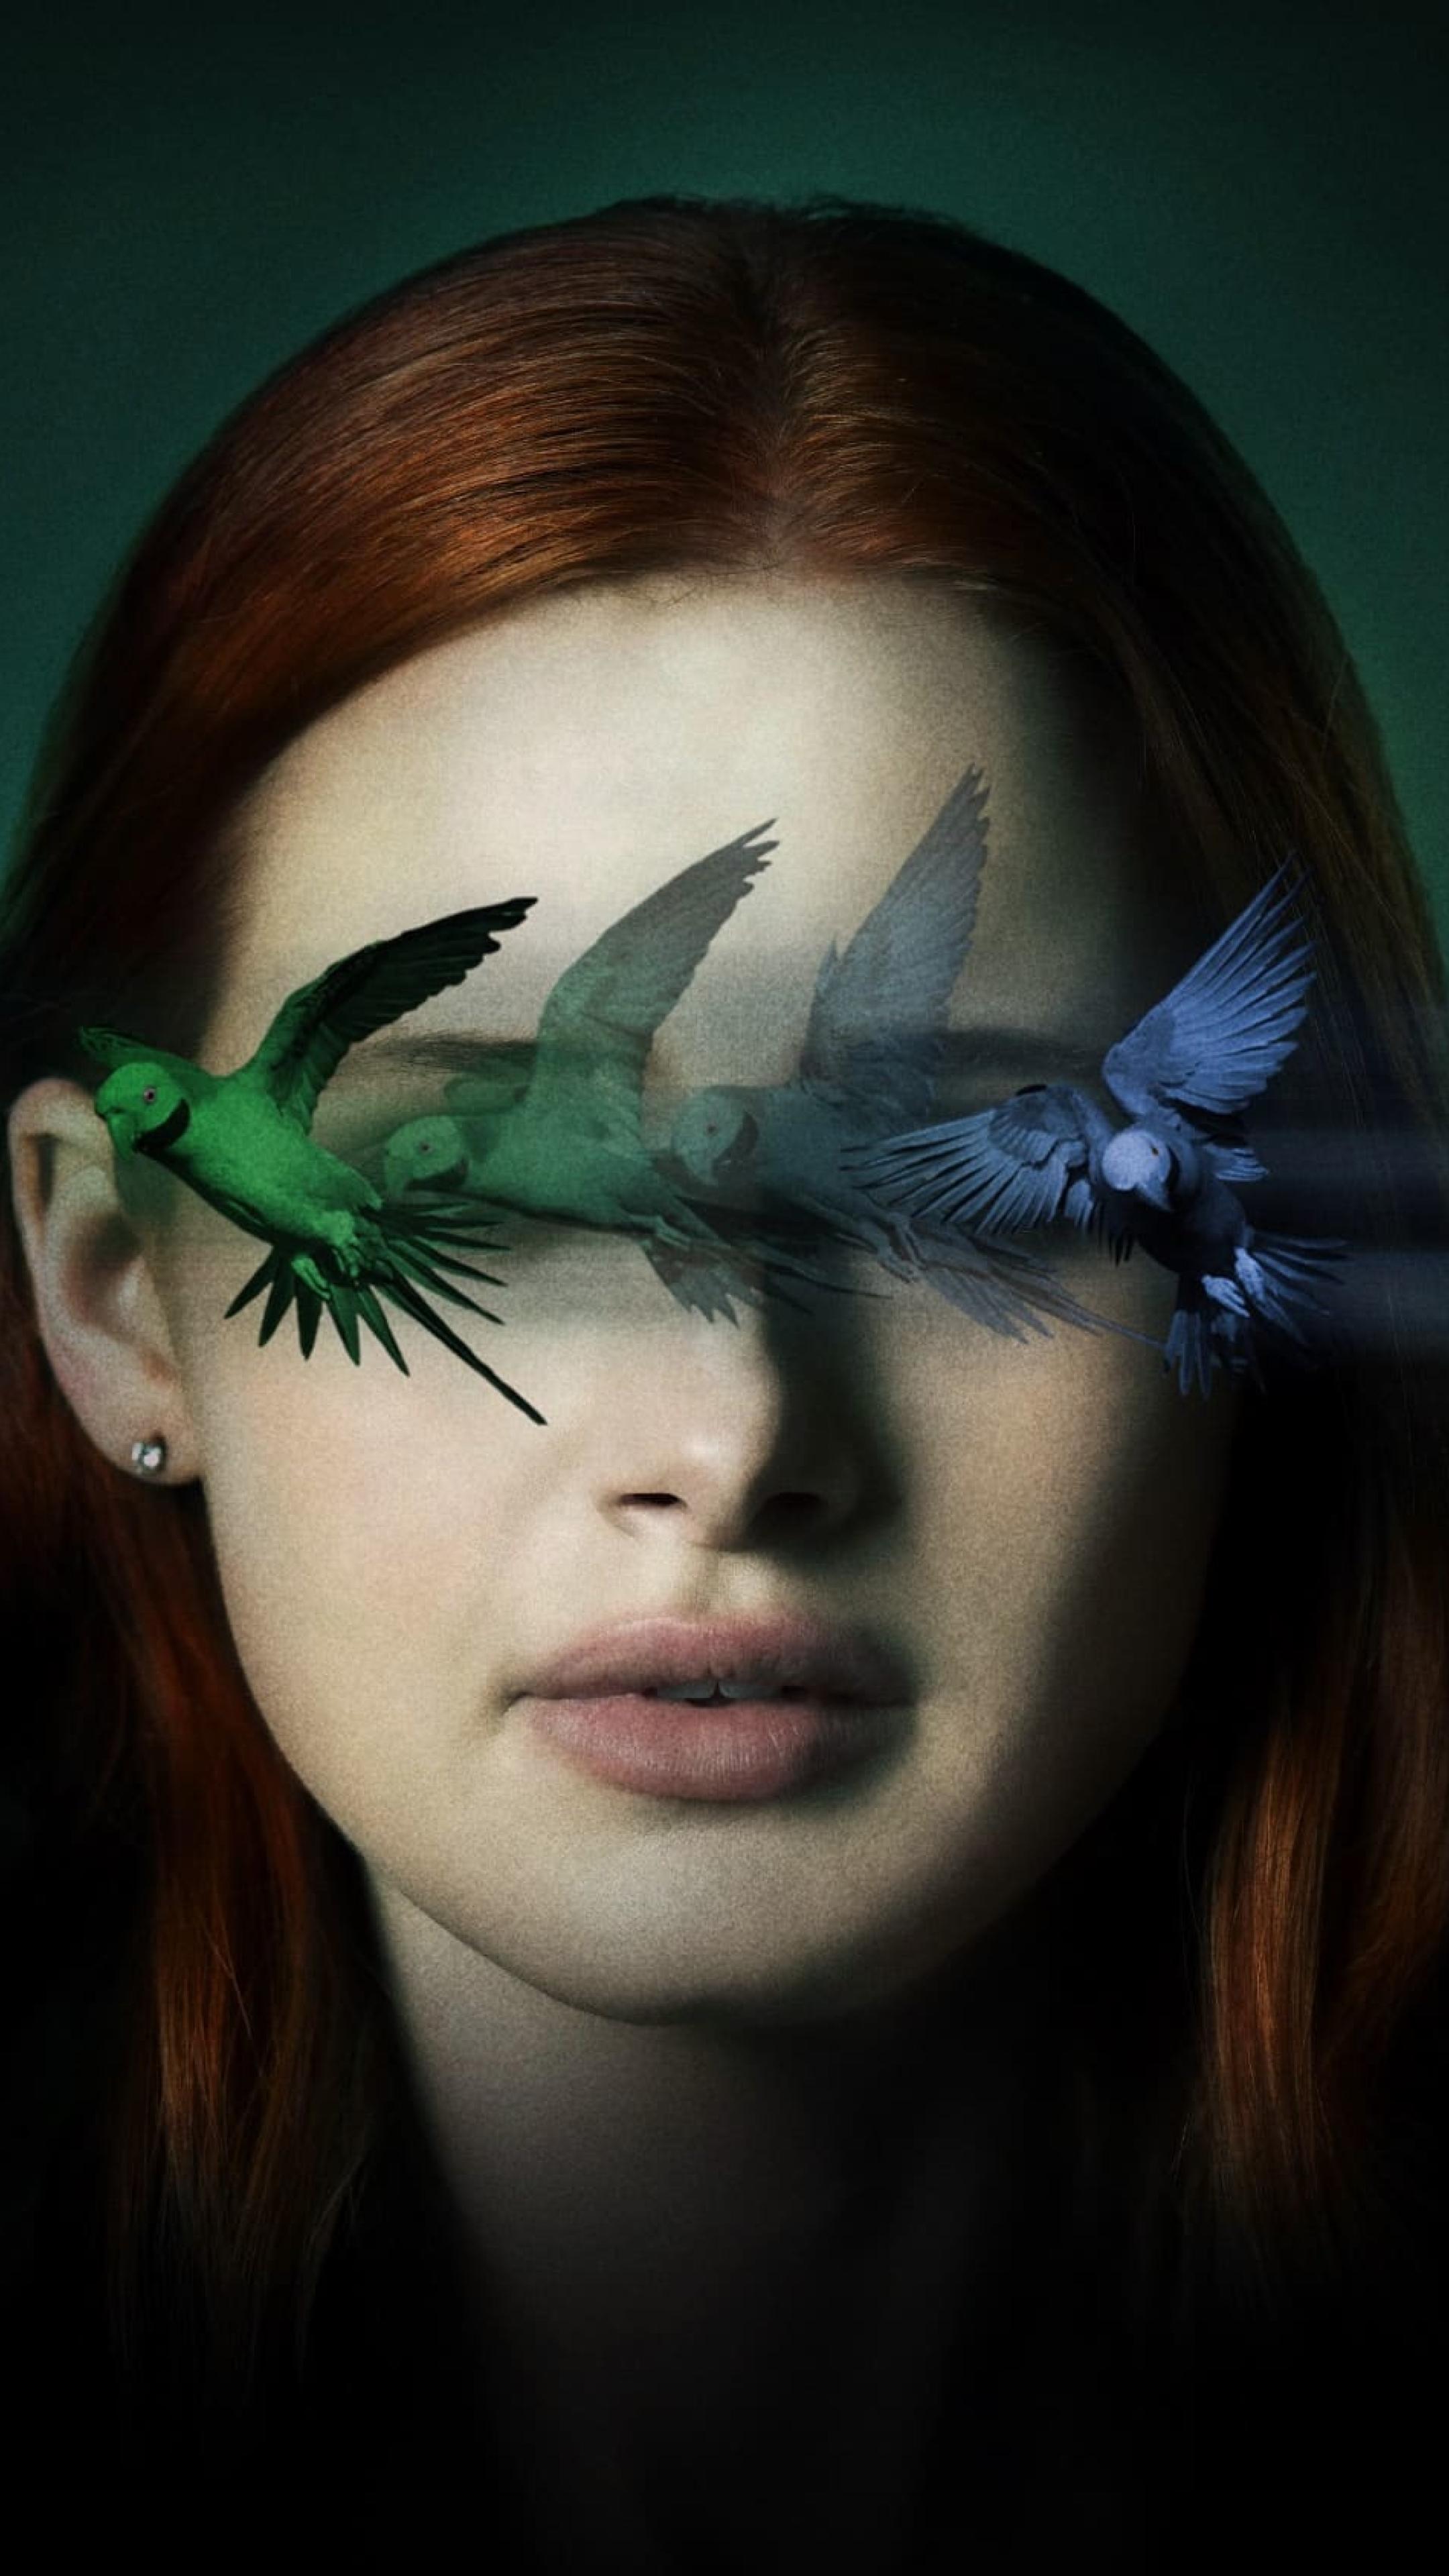 Madelaine Petsch Sightless Movie Wallpaper in 2160x3840 Resolution